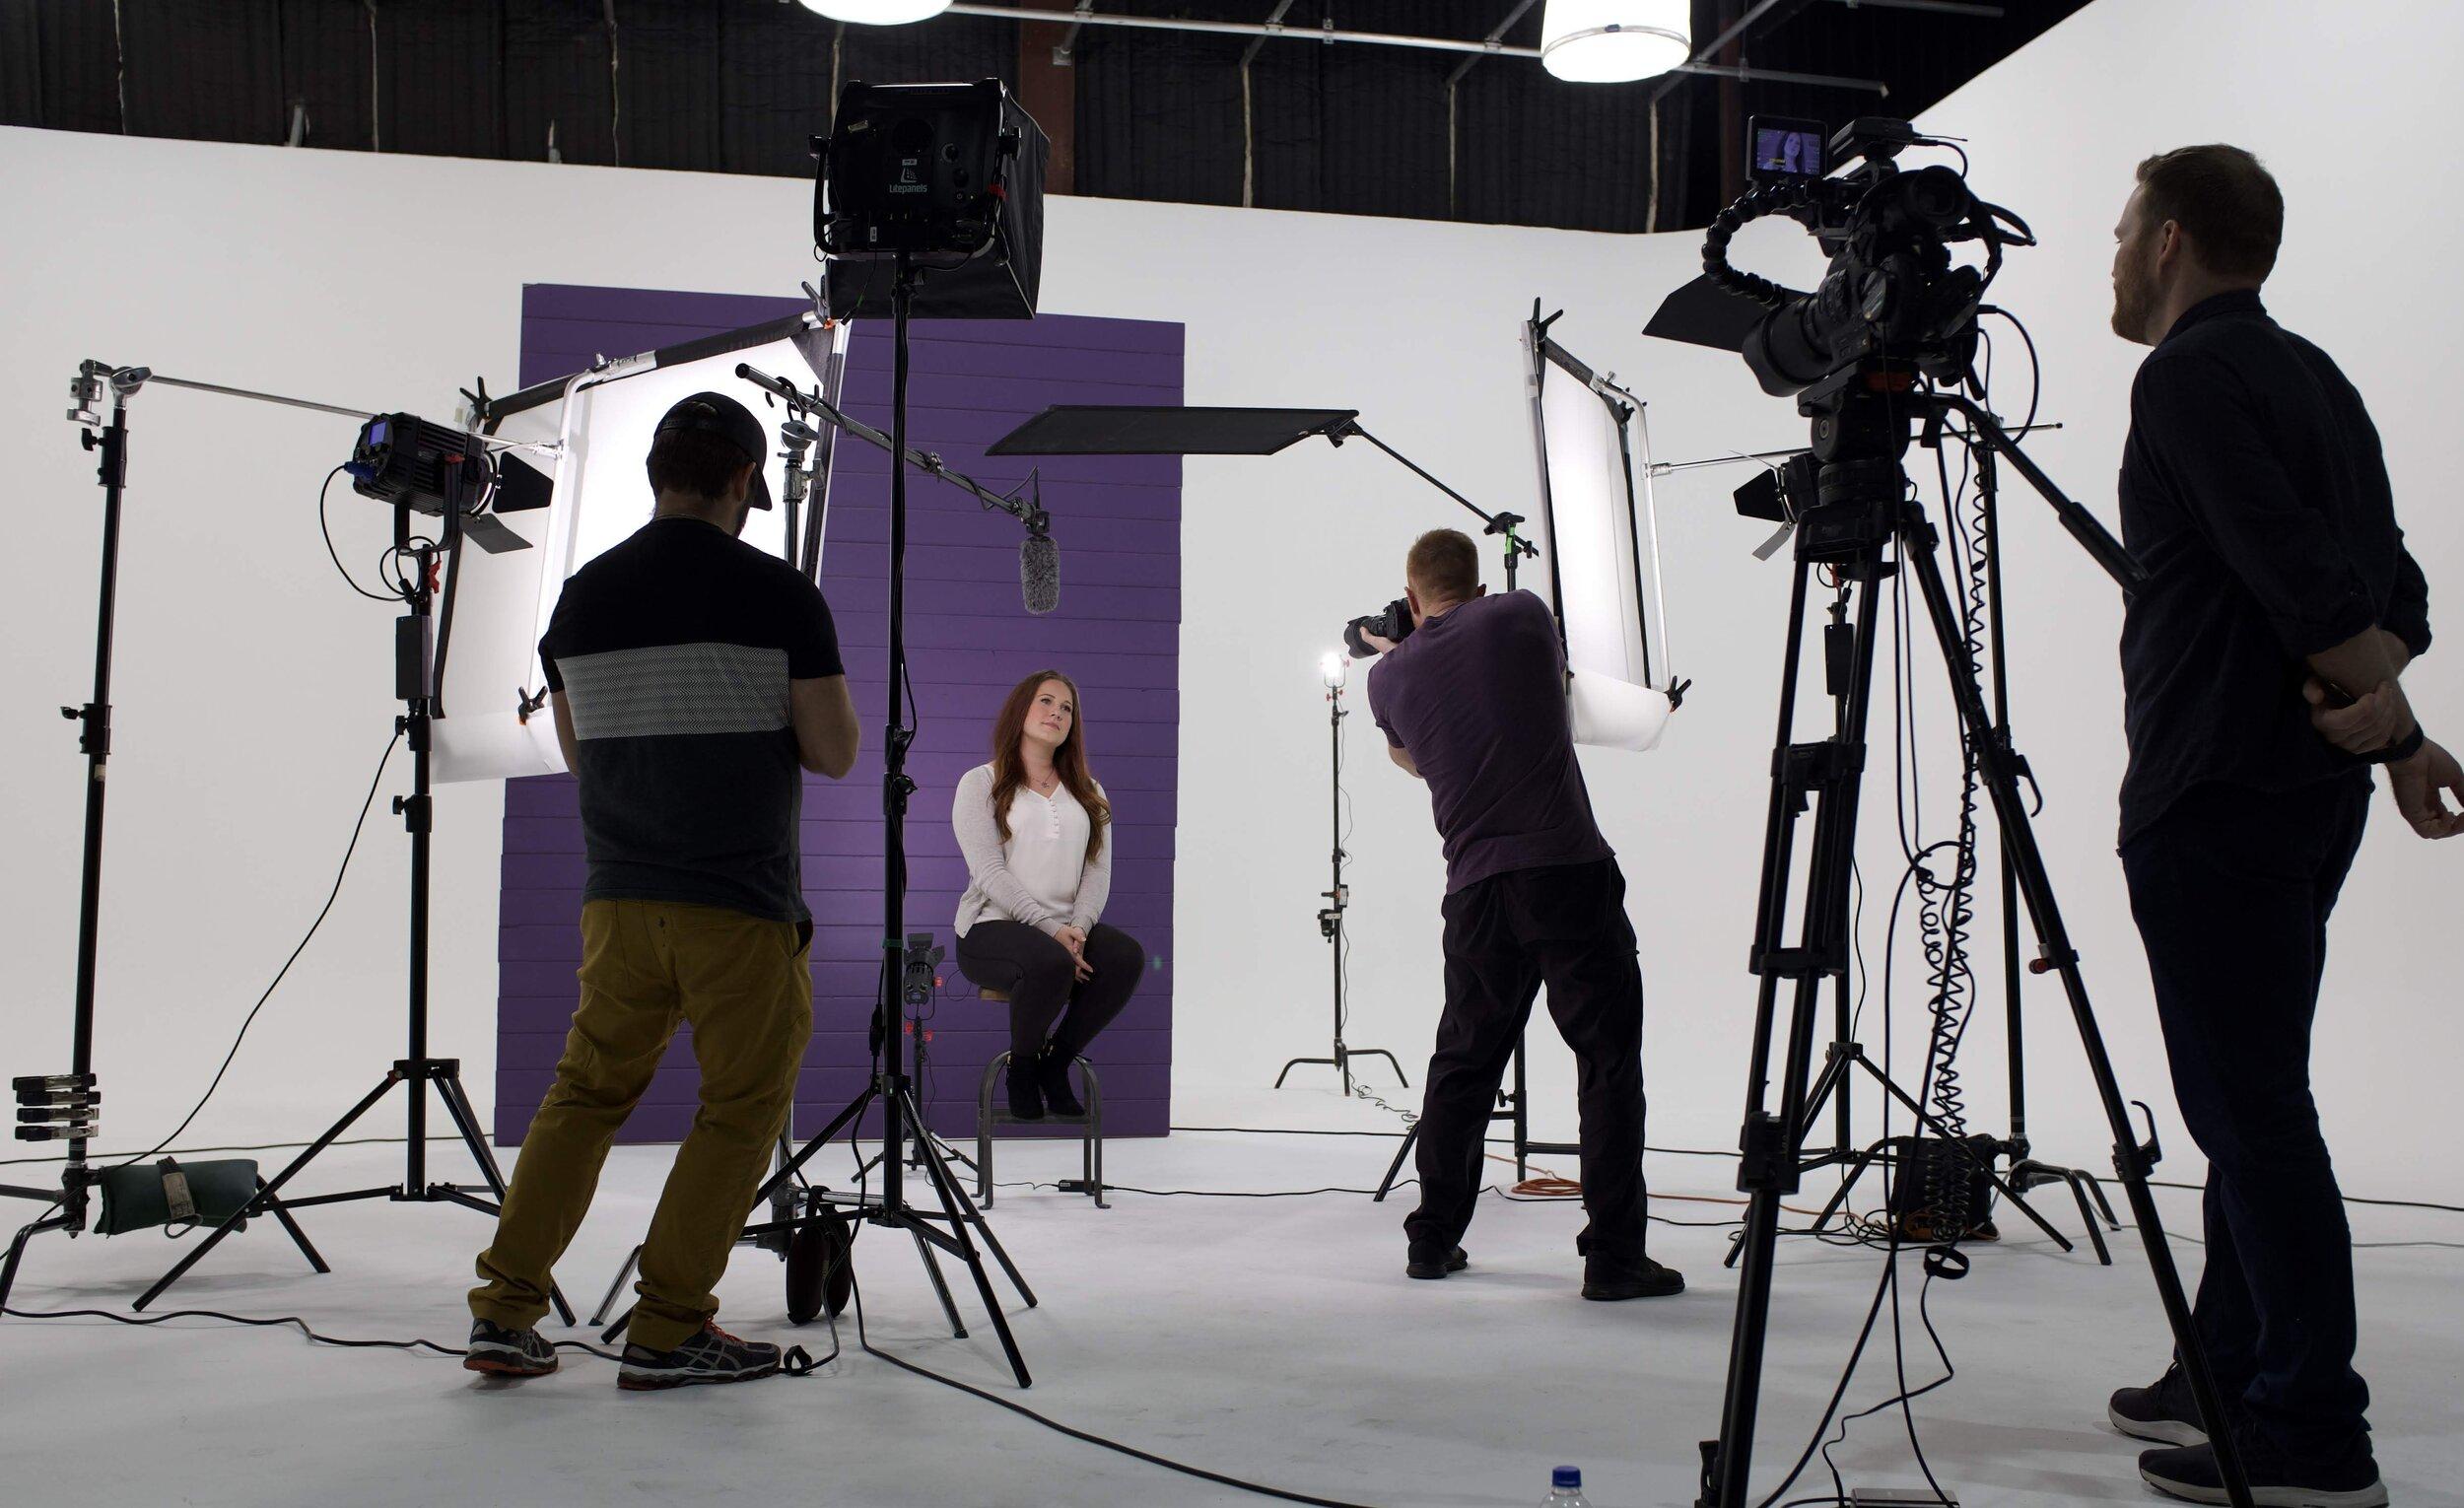 dox-video-production-hotline-leah.jpg